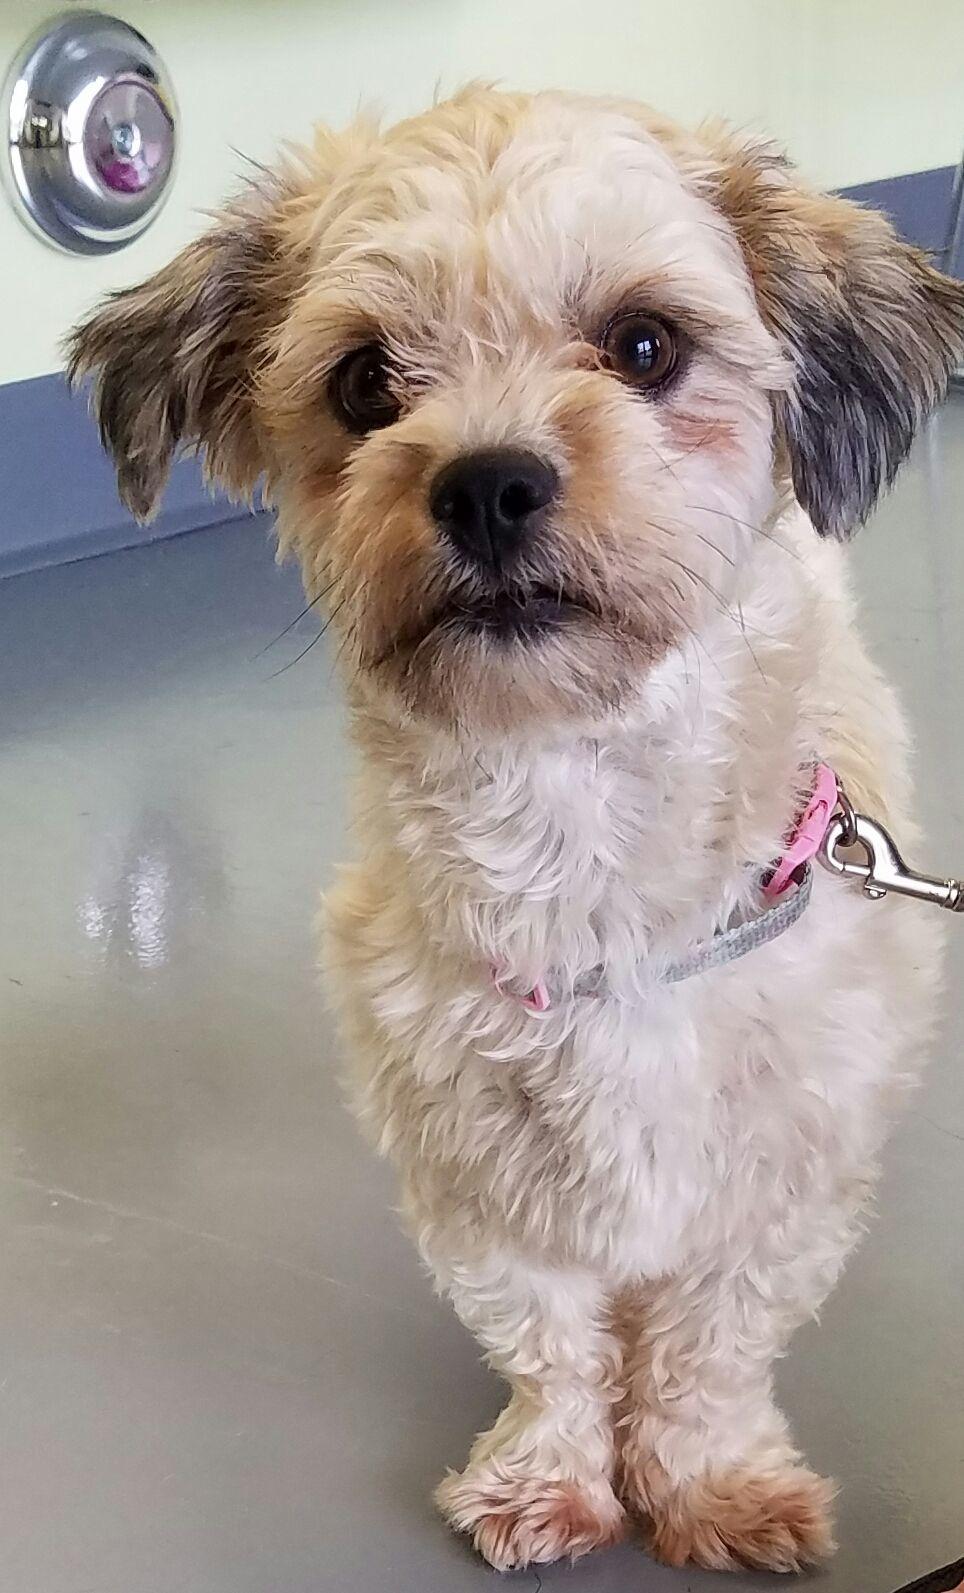 Shih Poo Dog For Adoption In Royal Palm Beach Fl Adn 542600 On